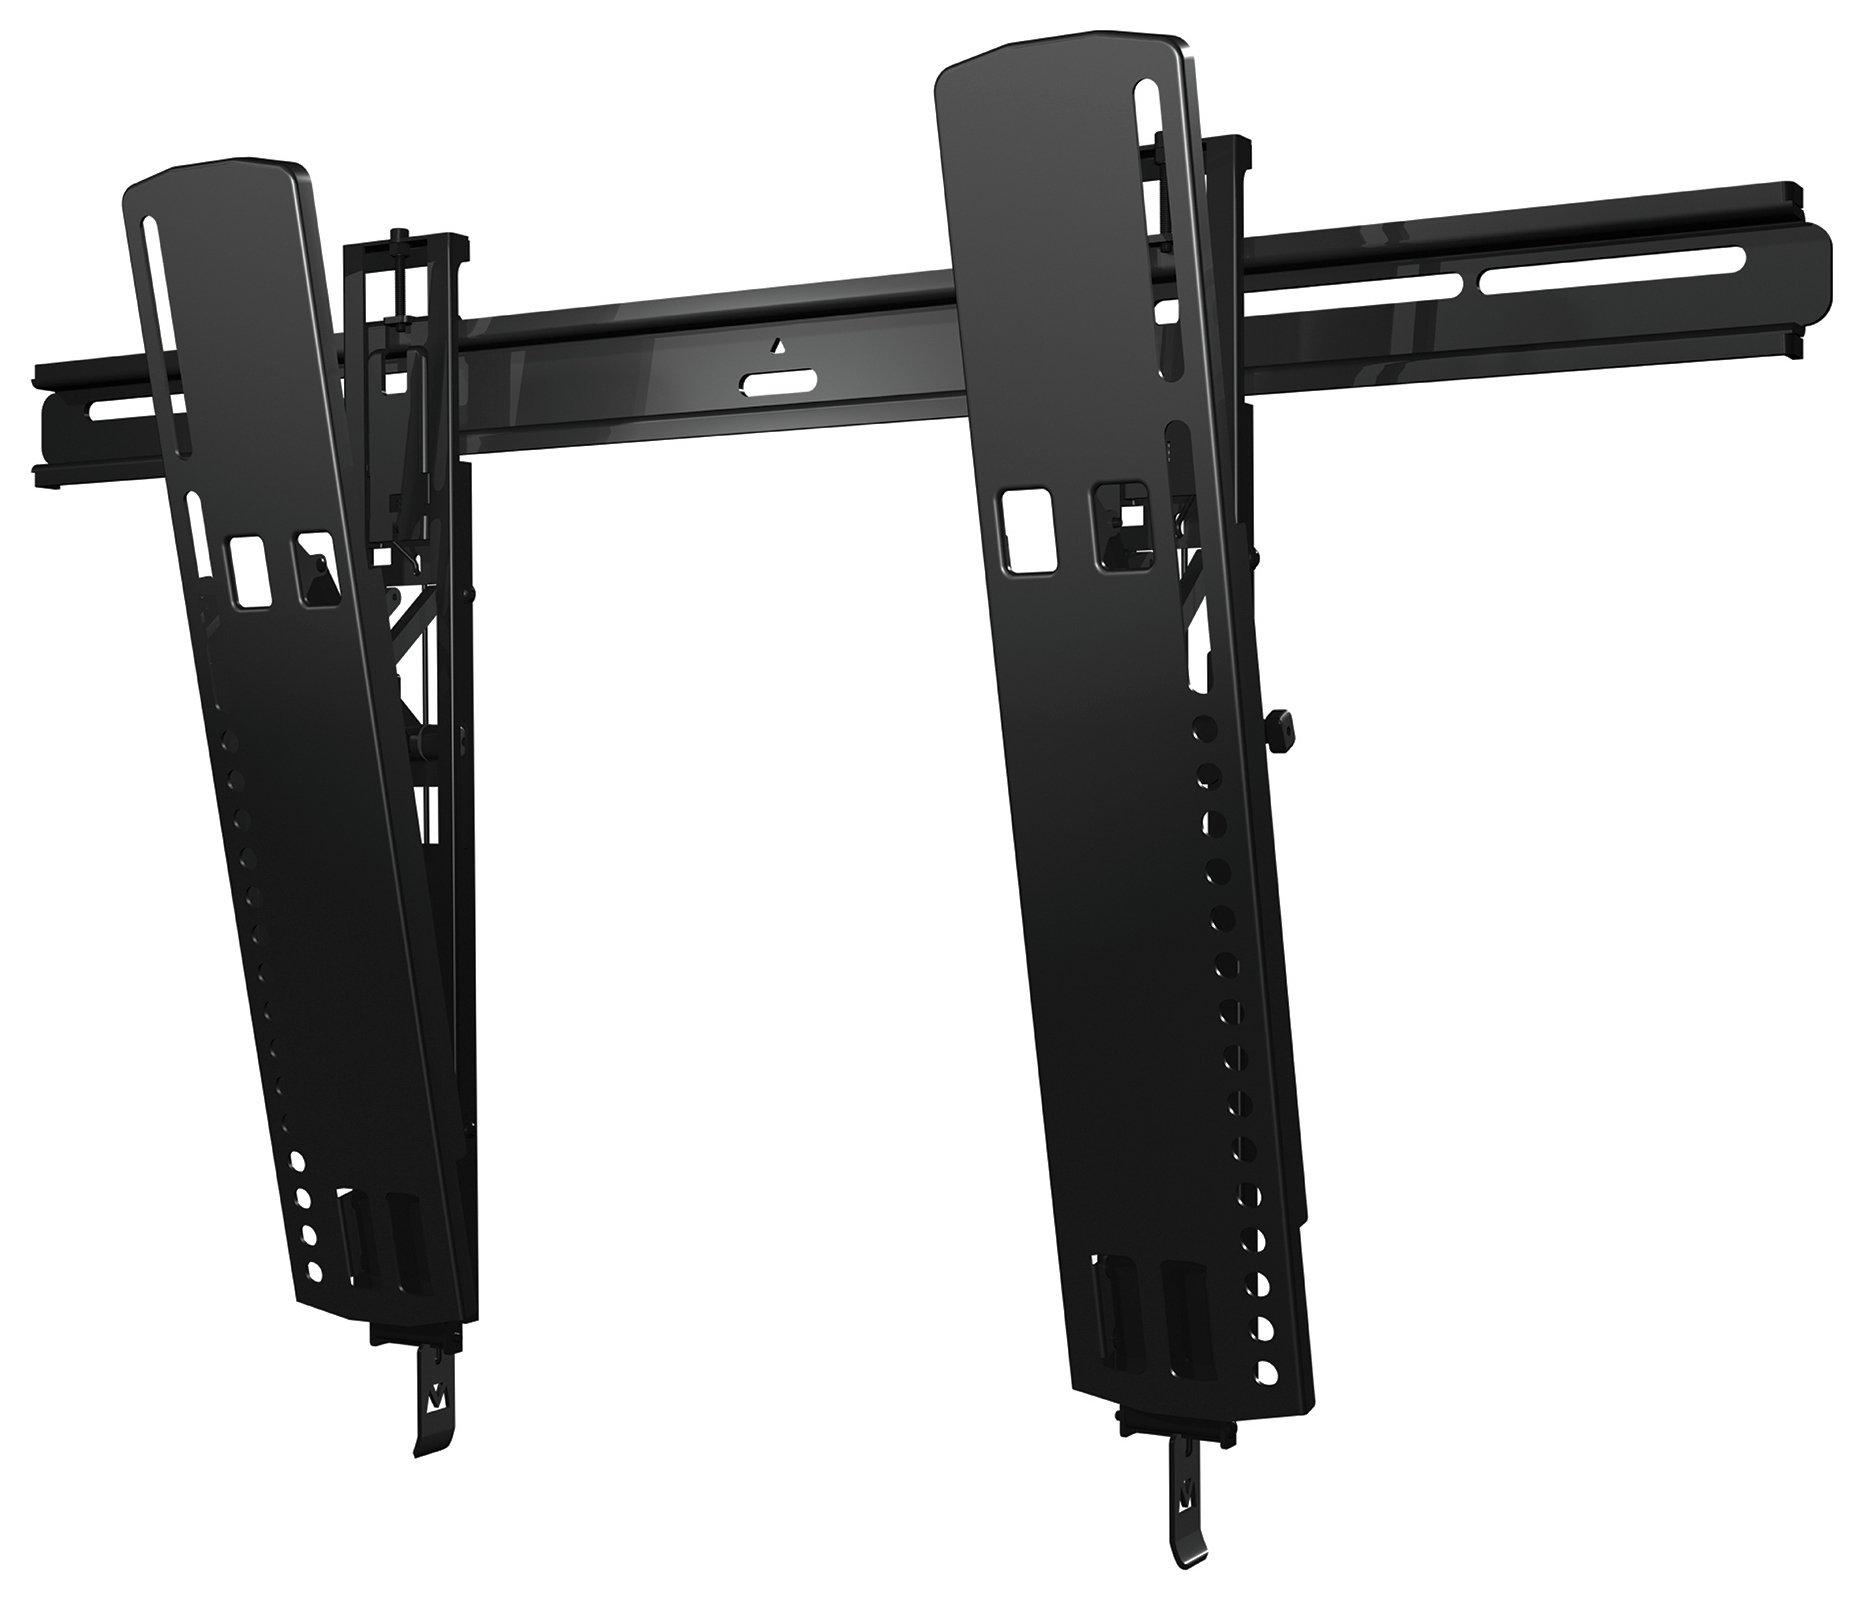 sanus premium super slim 51 80 inch tv tilting mount review. Black Bedroom Furniture Sets. Home Design Ideas